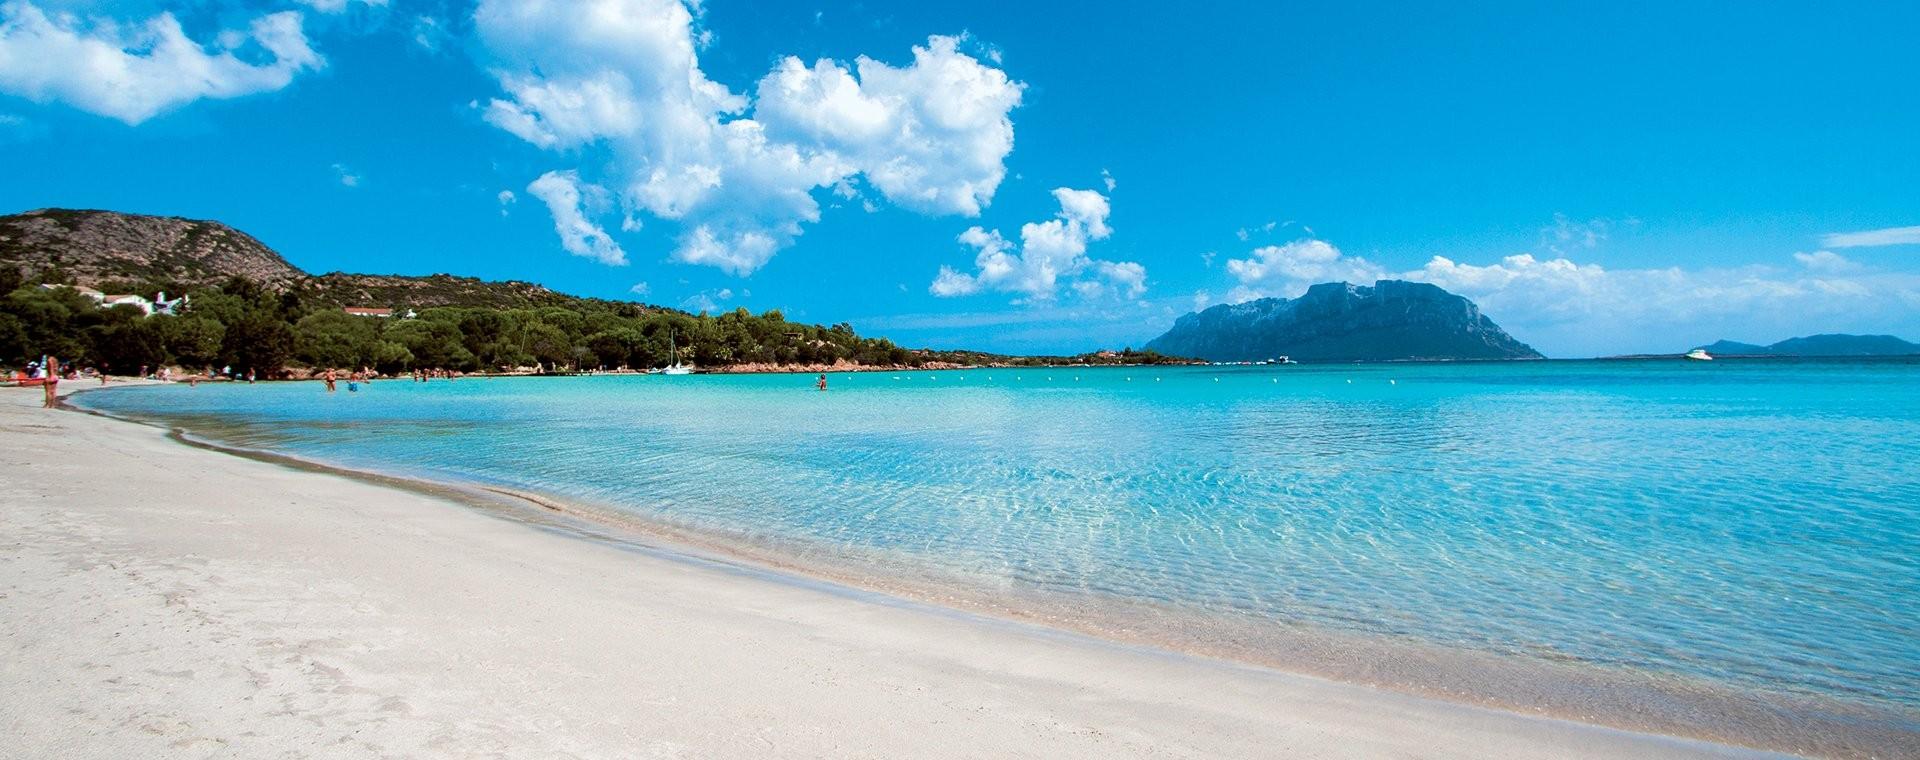 Spiagge-PortoIstana-RivistaDonna.com